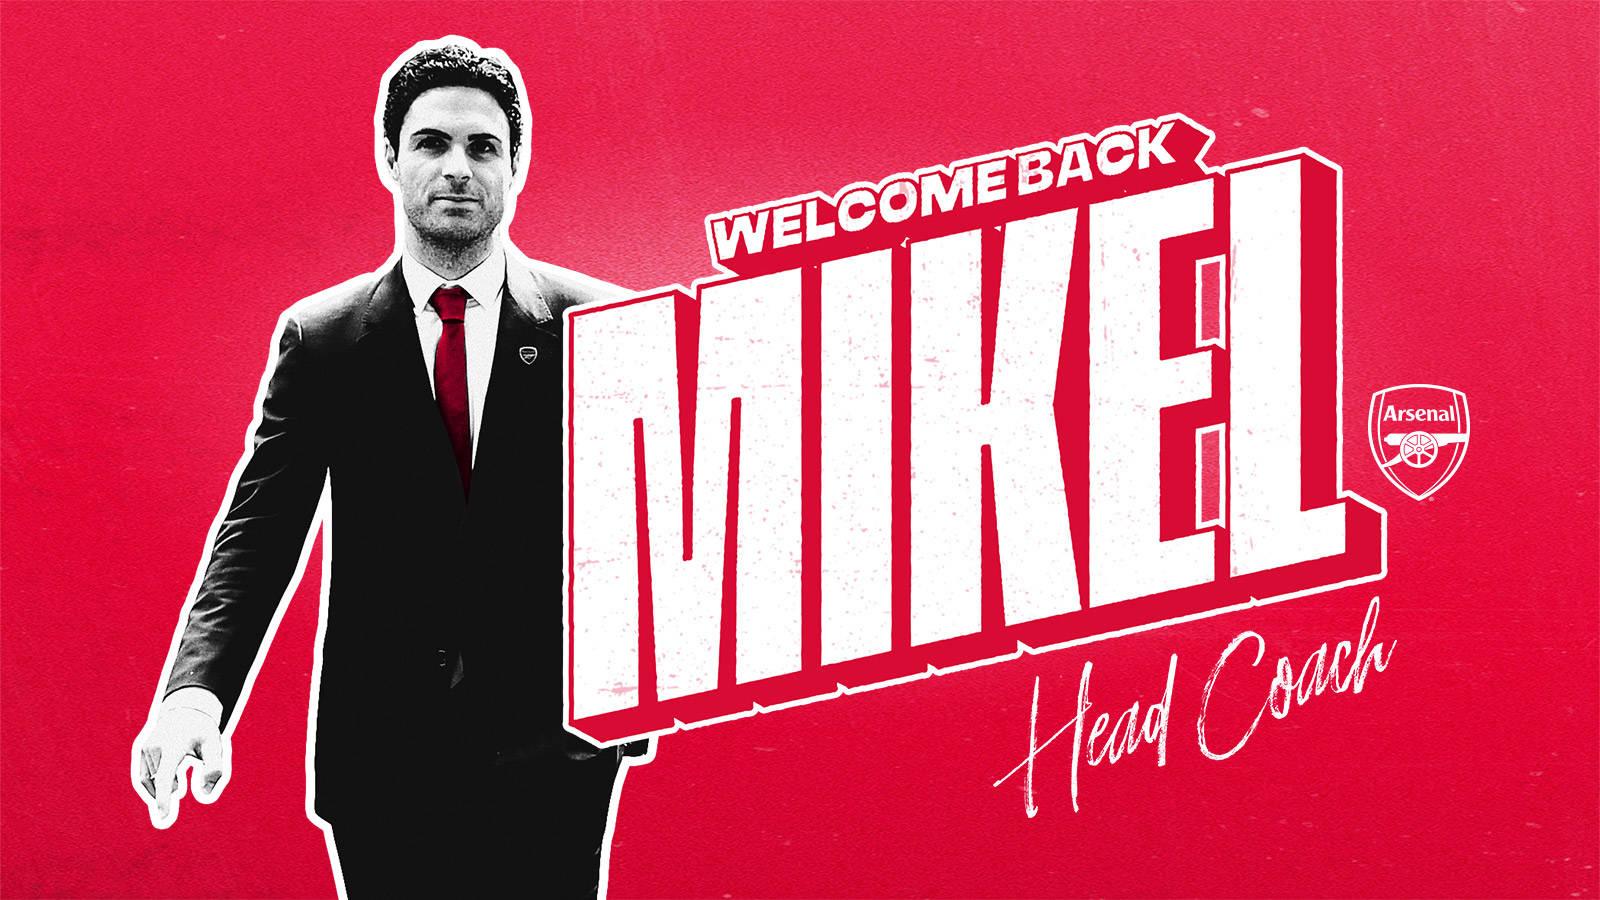 Mikel Arteta Joining As Our New Head Coach Club Announcement News Arsenal Com